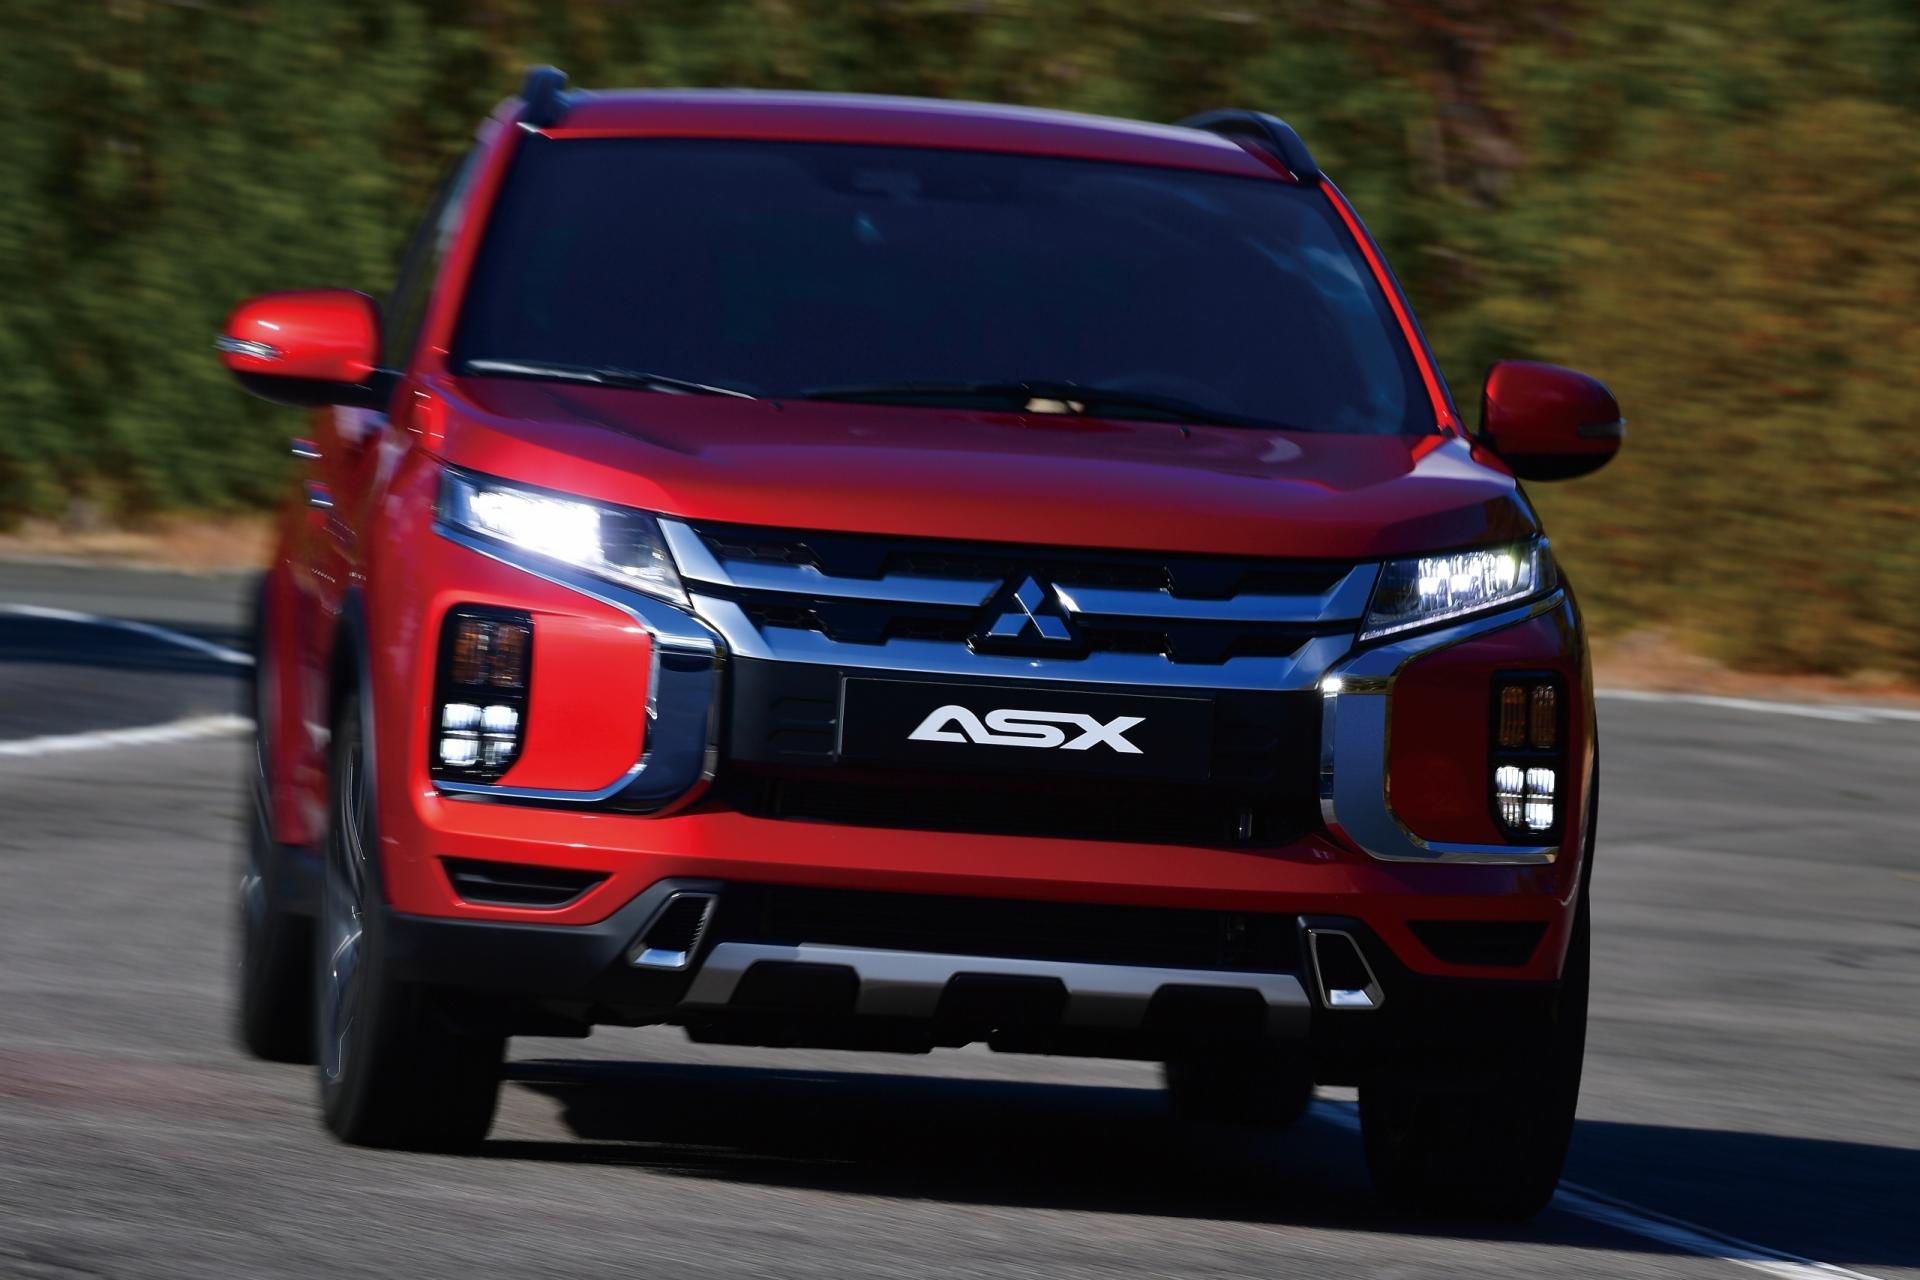 Mitsubishi ASX - цены, отзывы, характеристики ASX от Mitsubishi